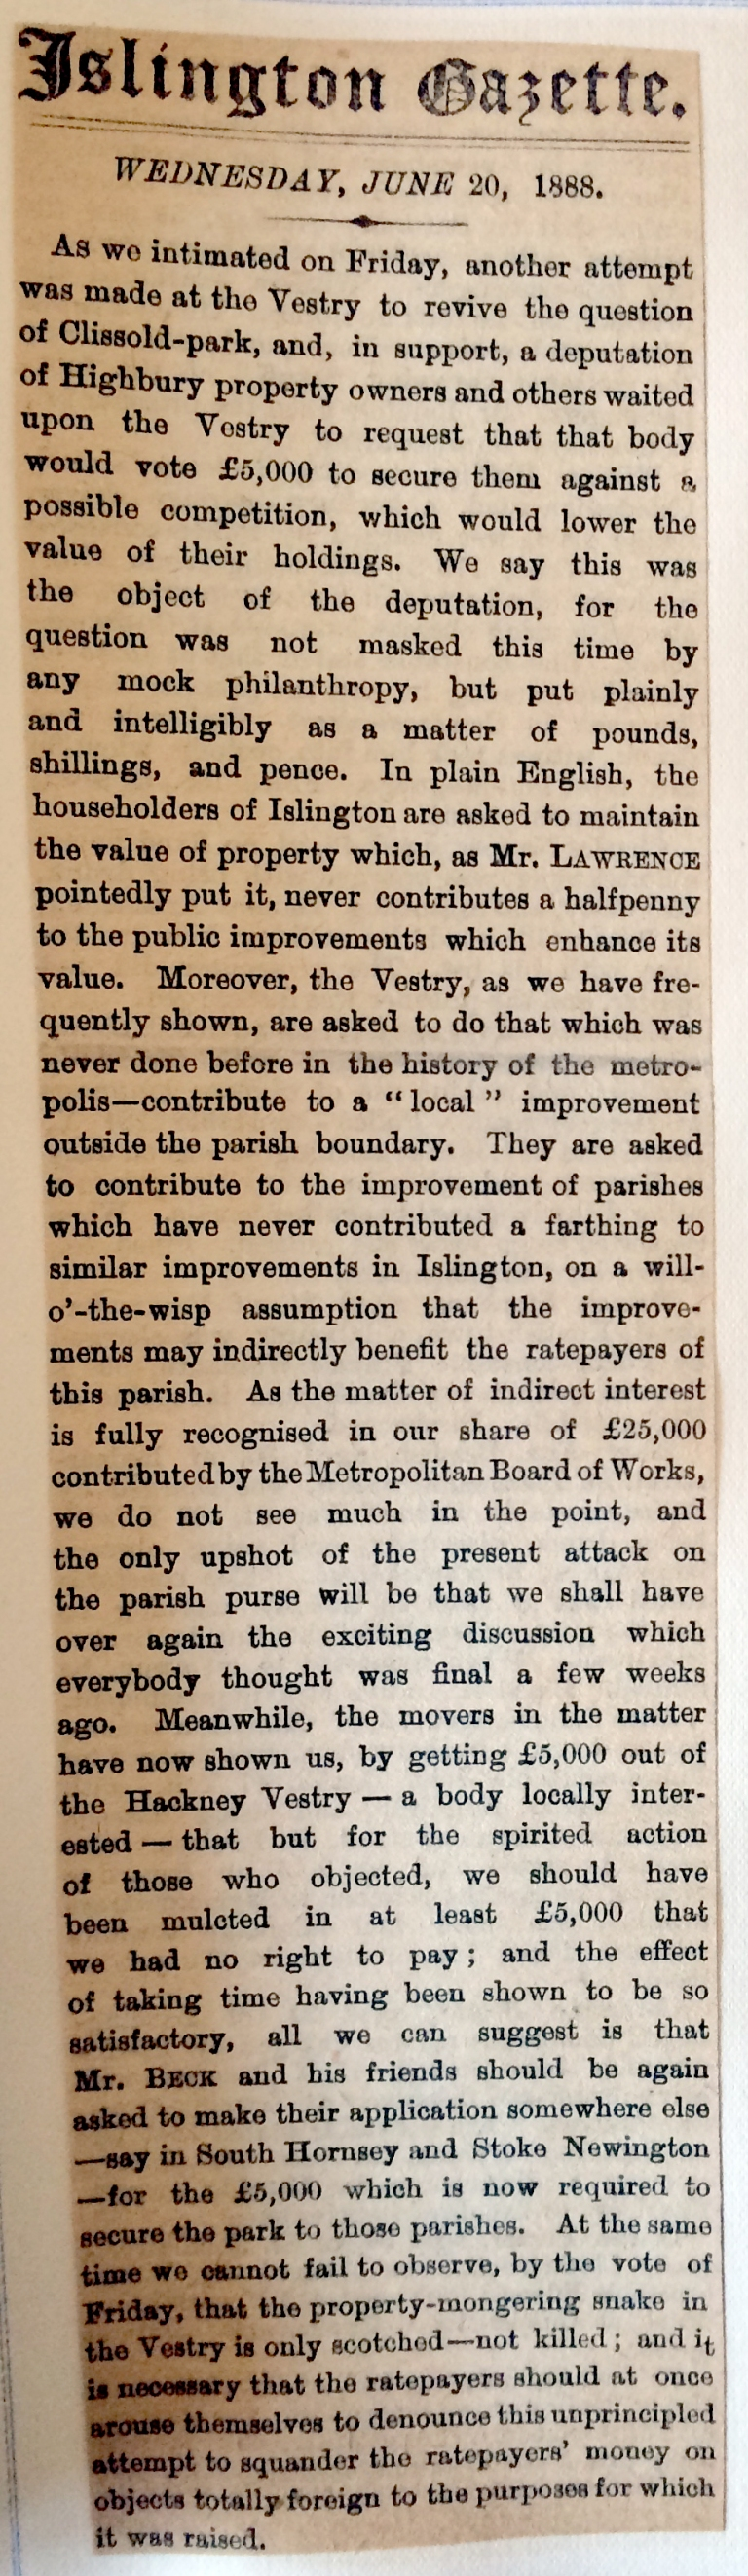 20_06_1888 Islington Gazette [CHECKED]